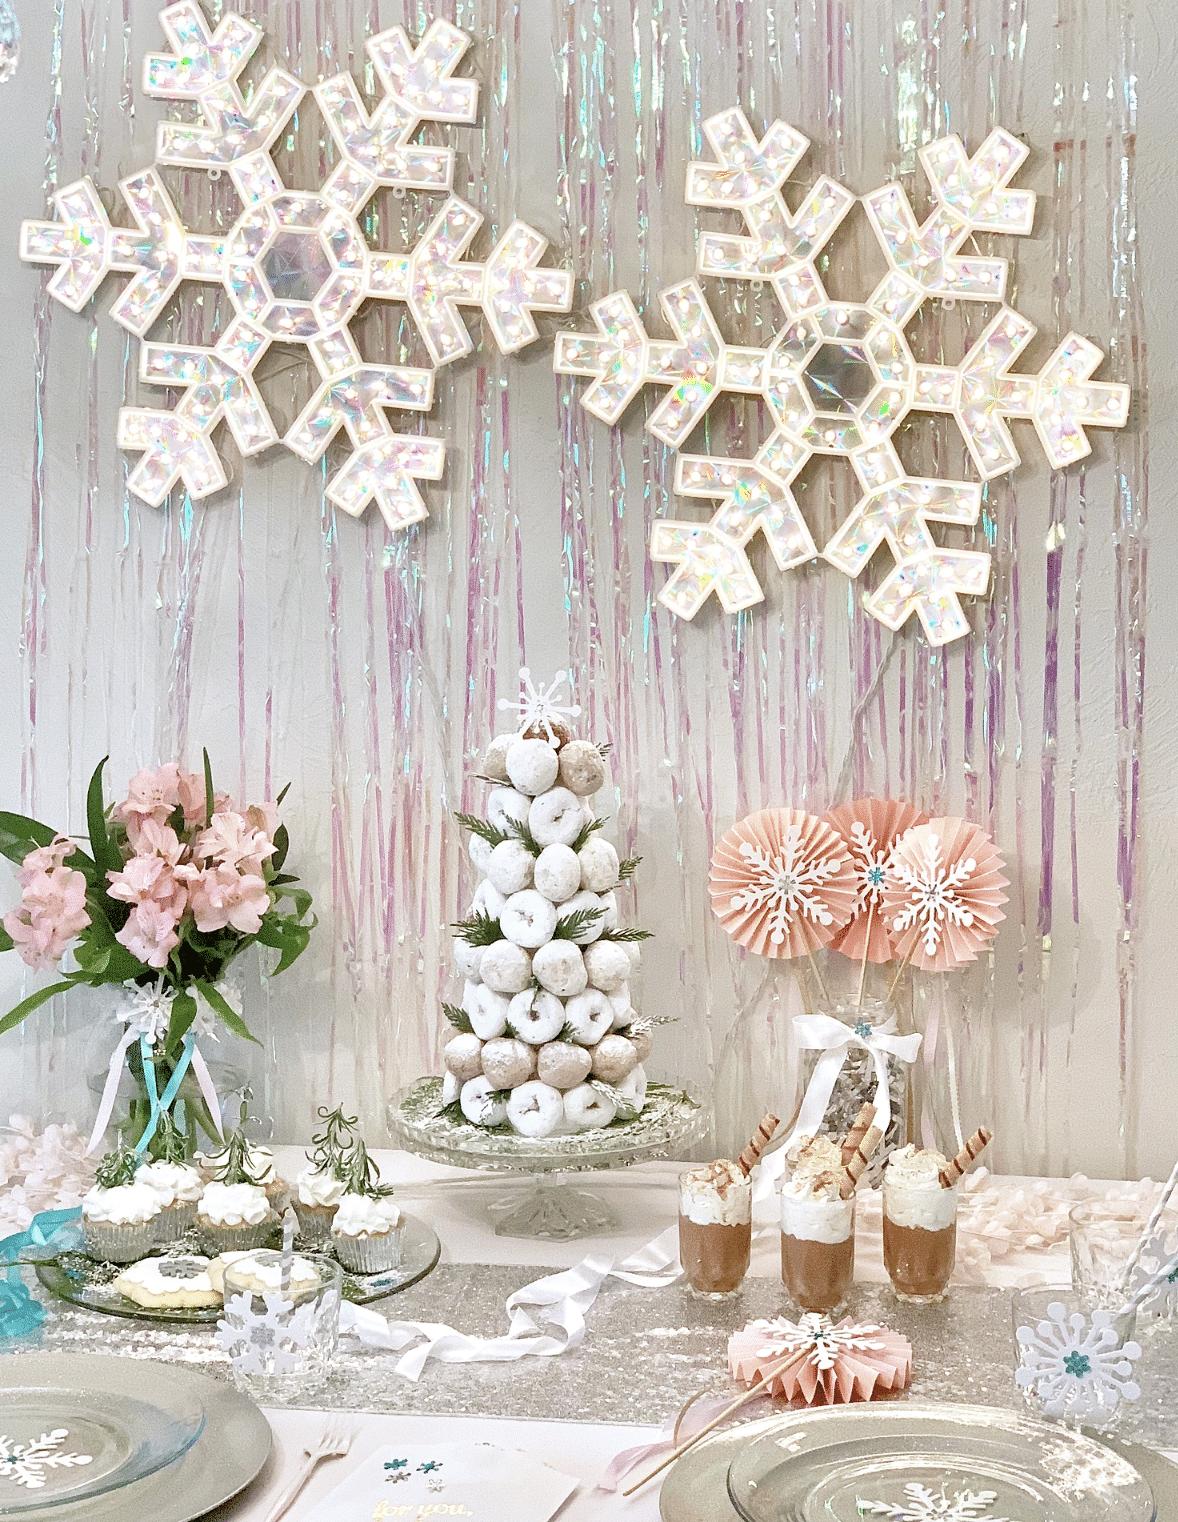 Winter wonderland Christmas party themes